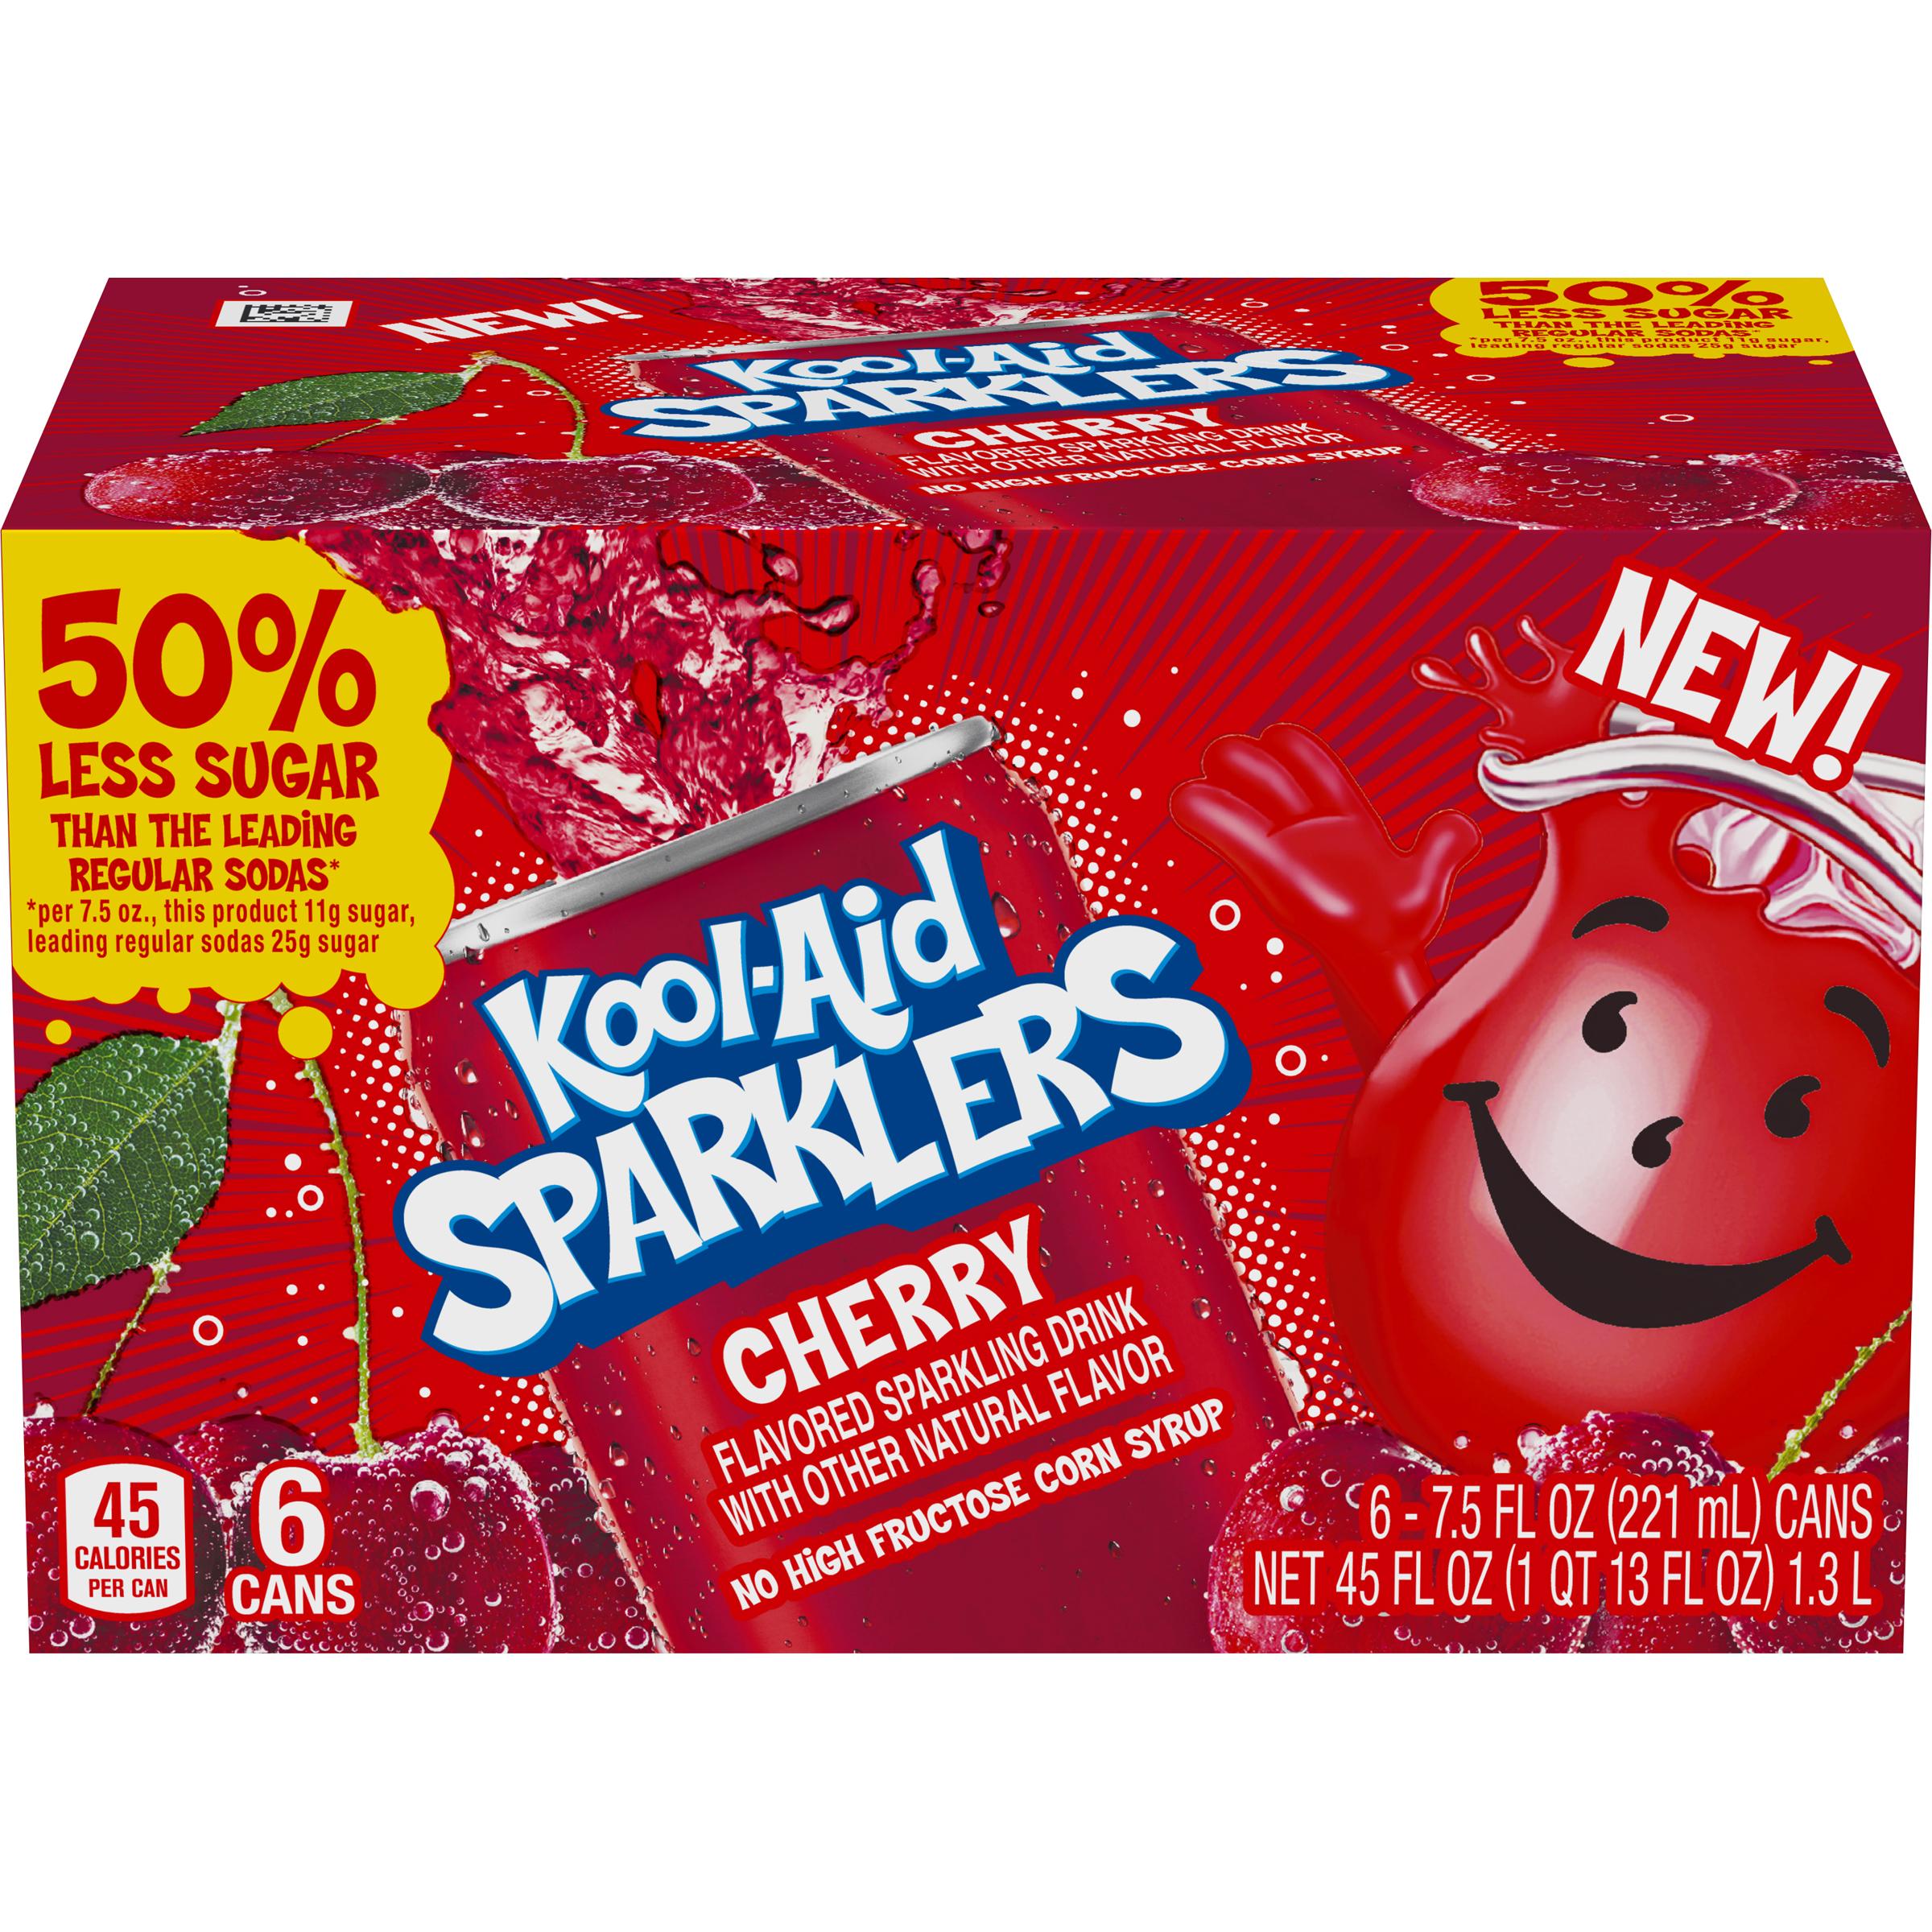 Kool Aid Sparklers Kool Aid Sparklers Cherry Sparkling Drink  7.5 oz Can 6 pack image